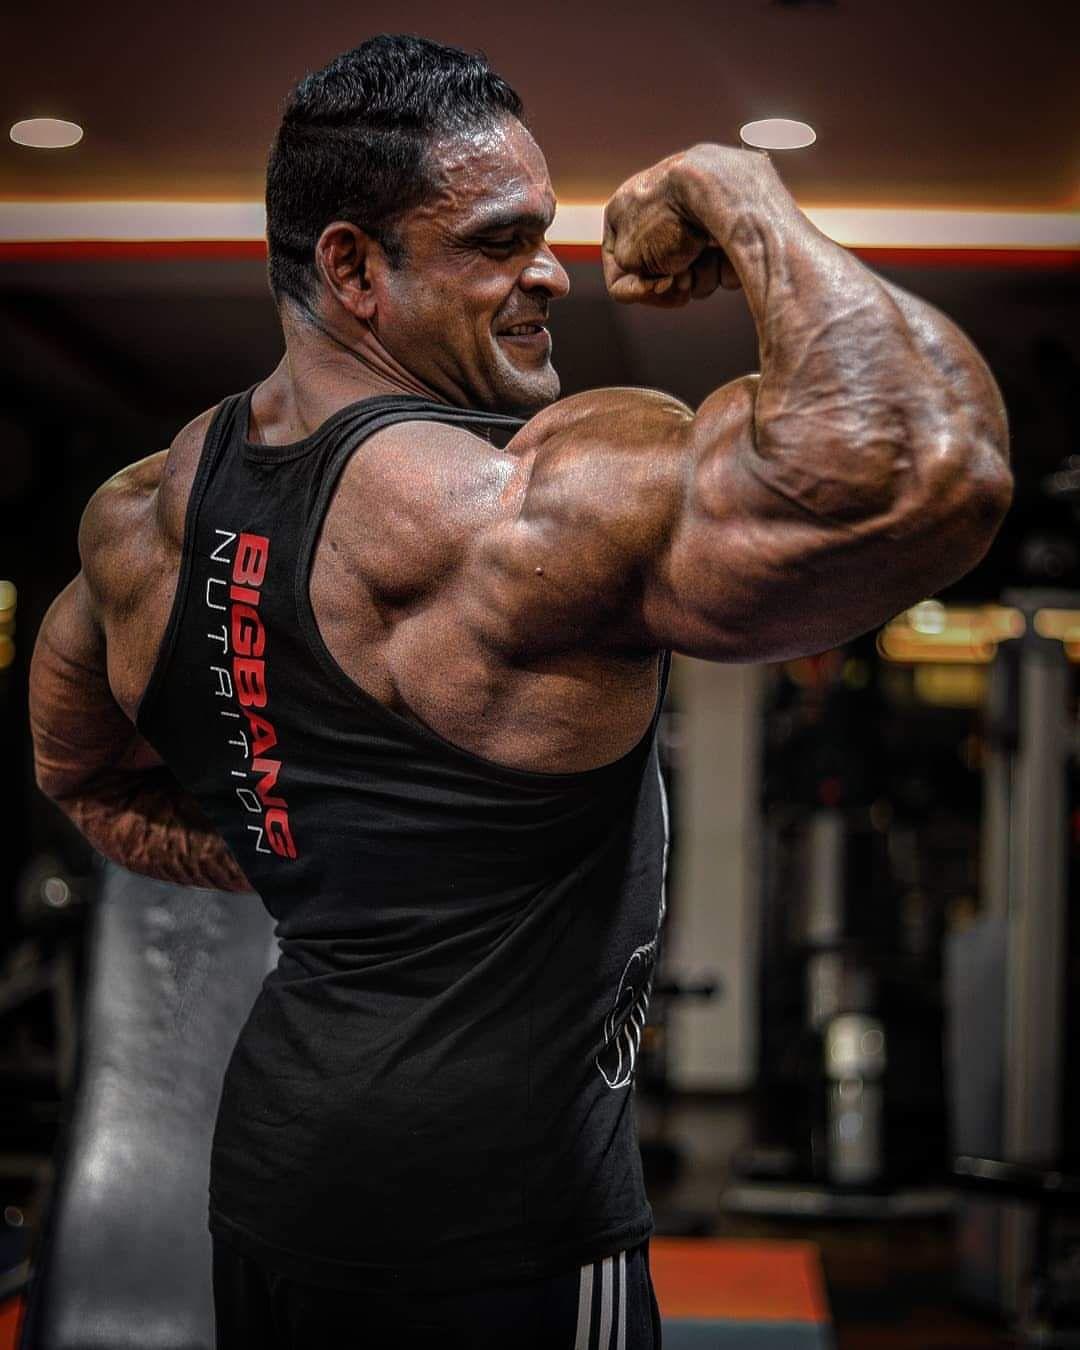 Pin by Jon Doez on JUST MUSCLES | Statue, Bodybuilding